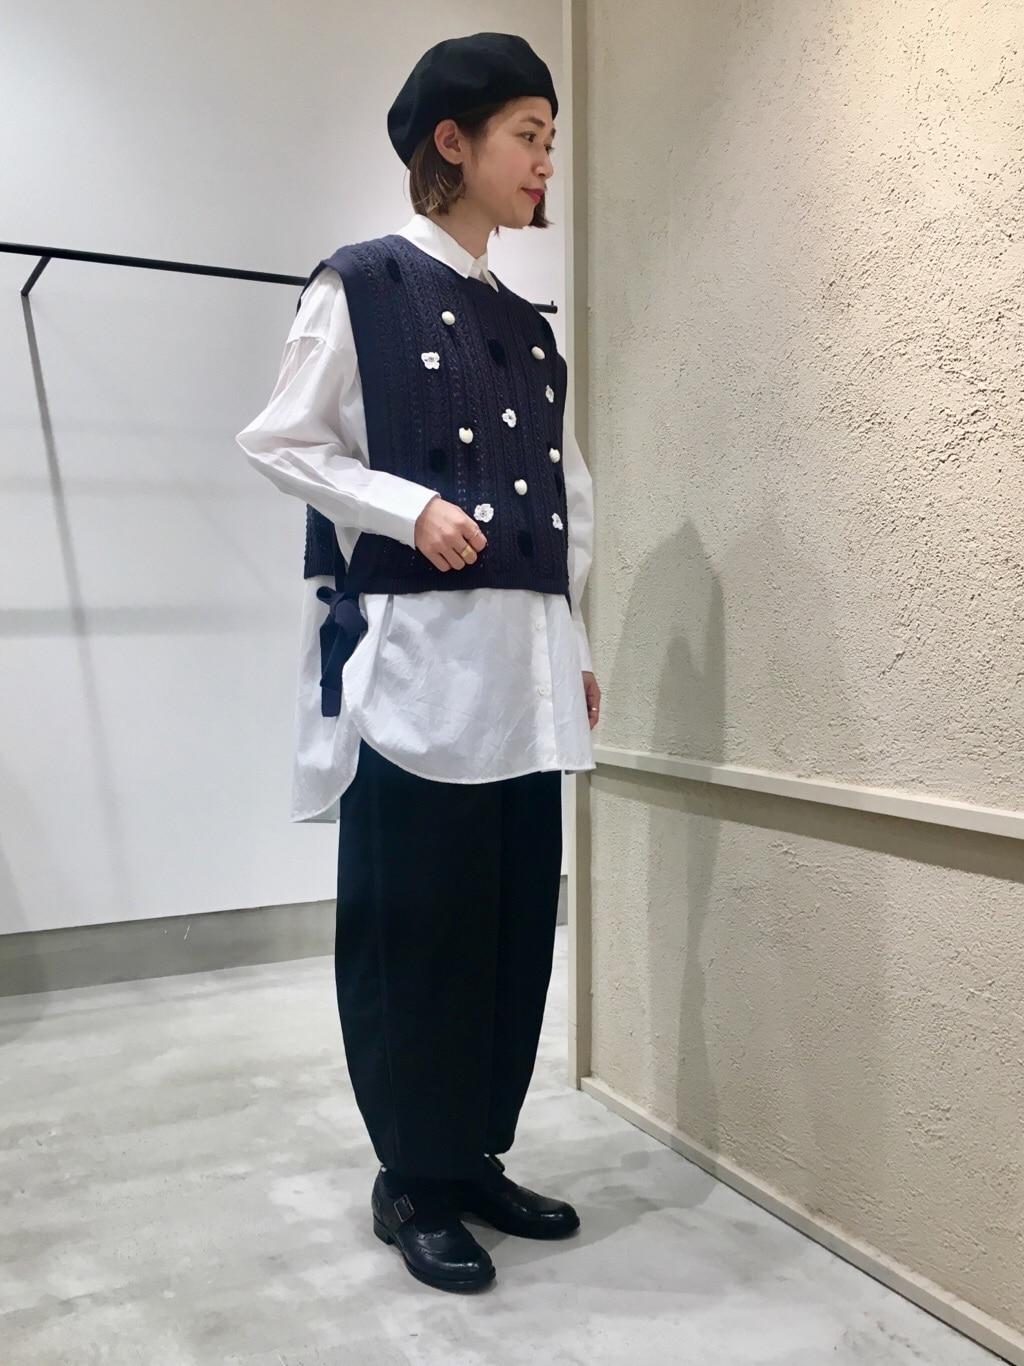 chambre de charme 横浜ジョイナス 身長:160cm 2021.01.08